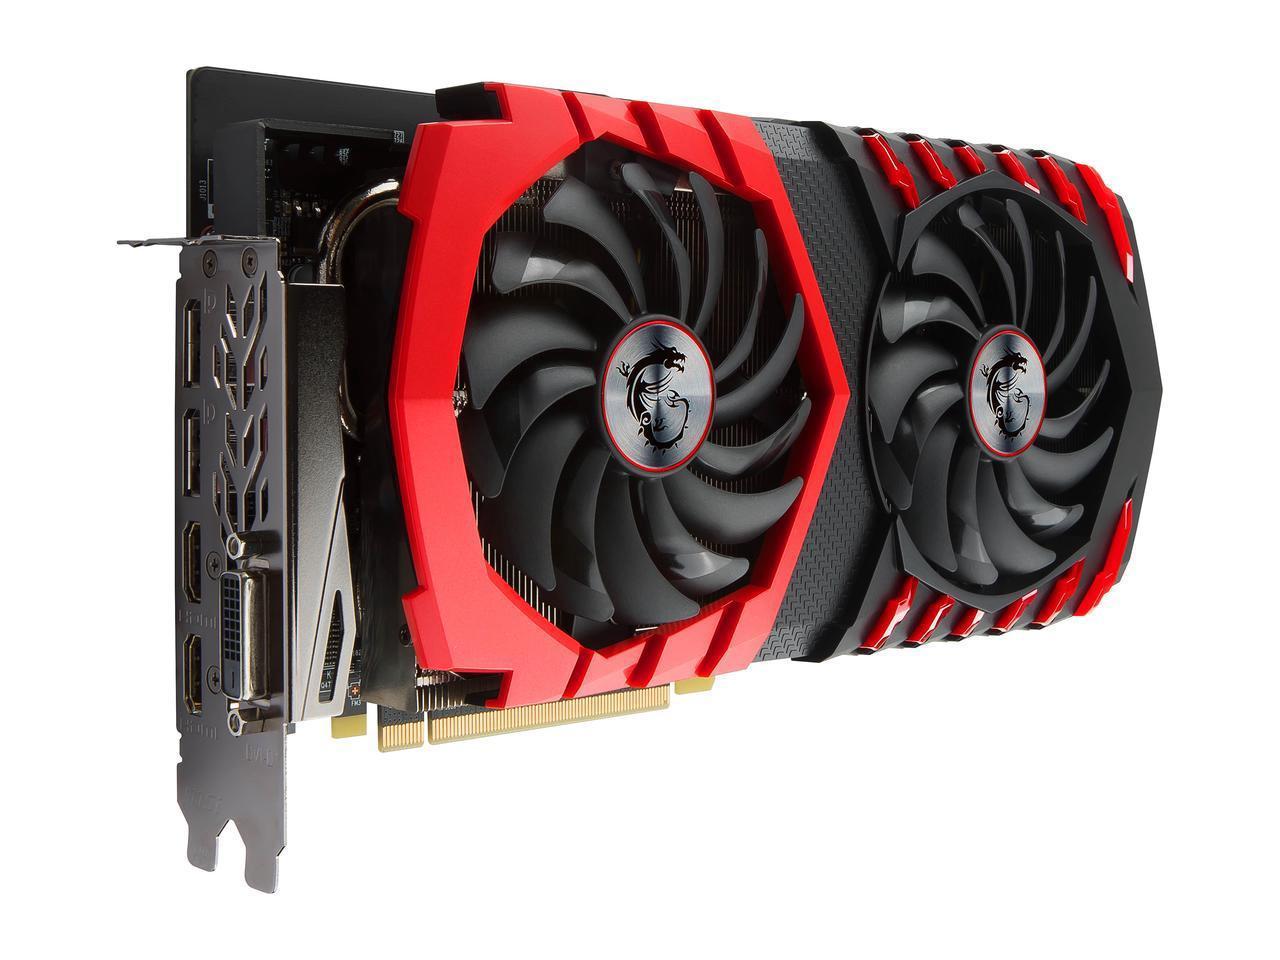 MSI Radeon RX 580 8GB Gaming